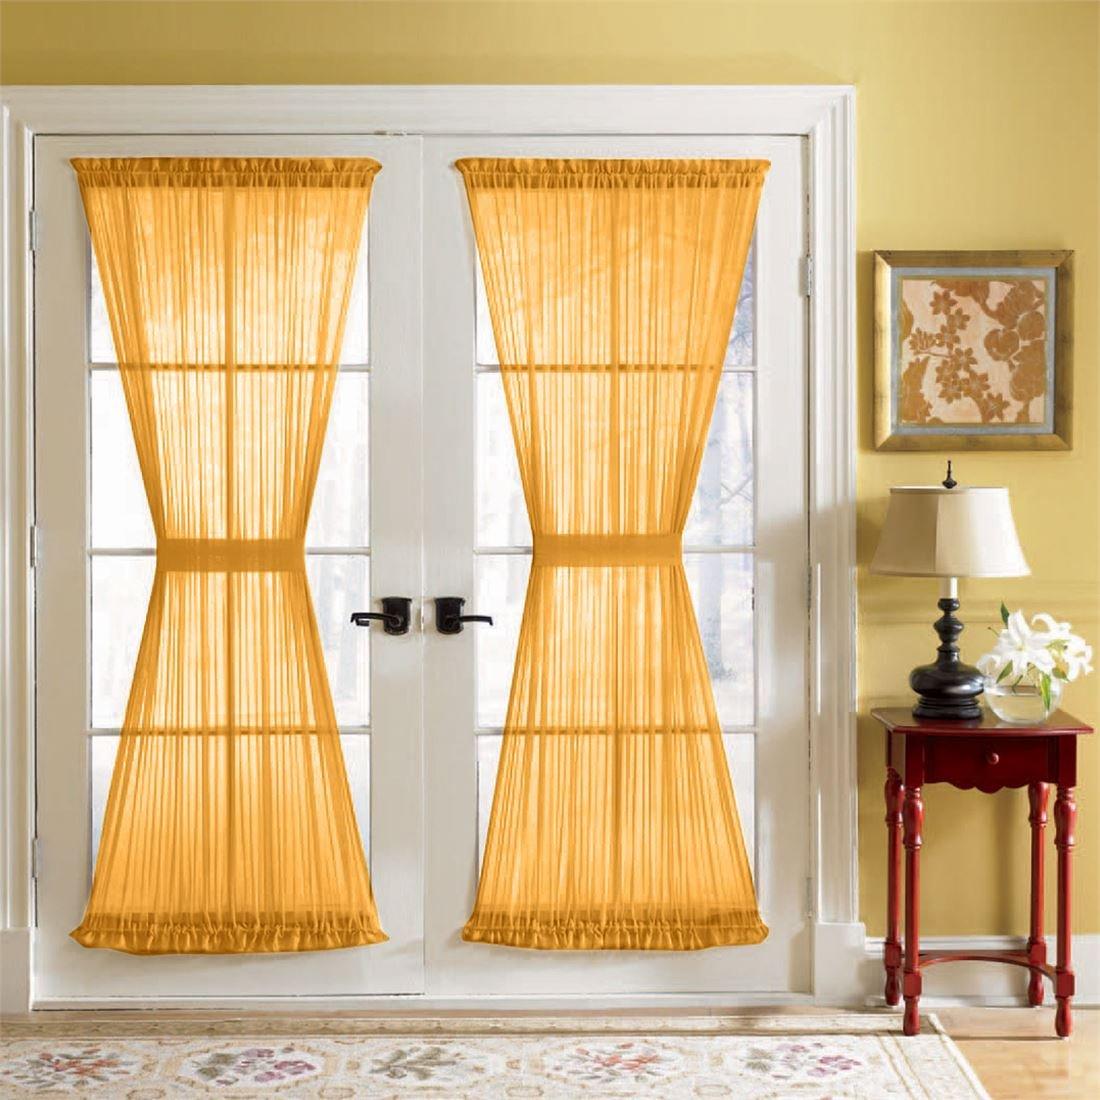 Duck River Rivietta Floral Linen 3 Piece Kitchen Curtain: Window Treatment Sets : Online Shopping For Clothing